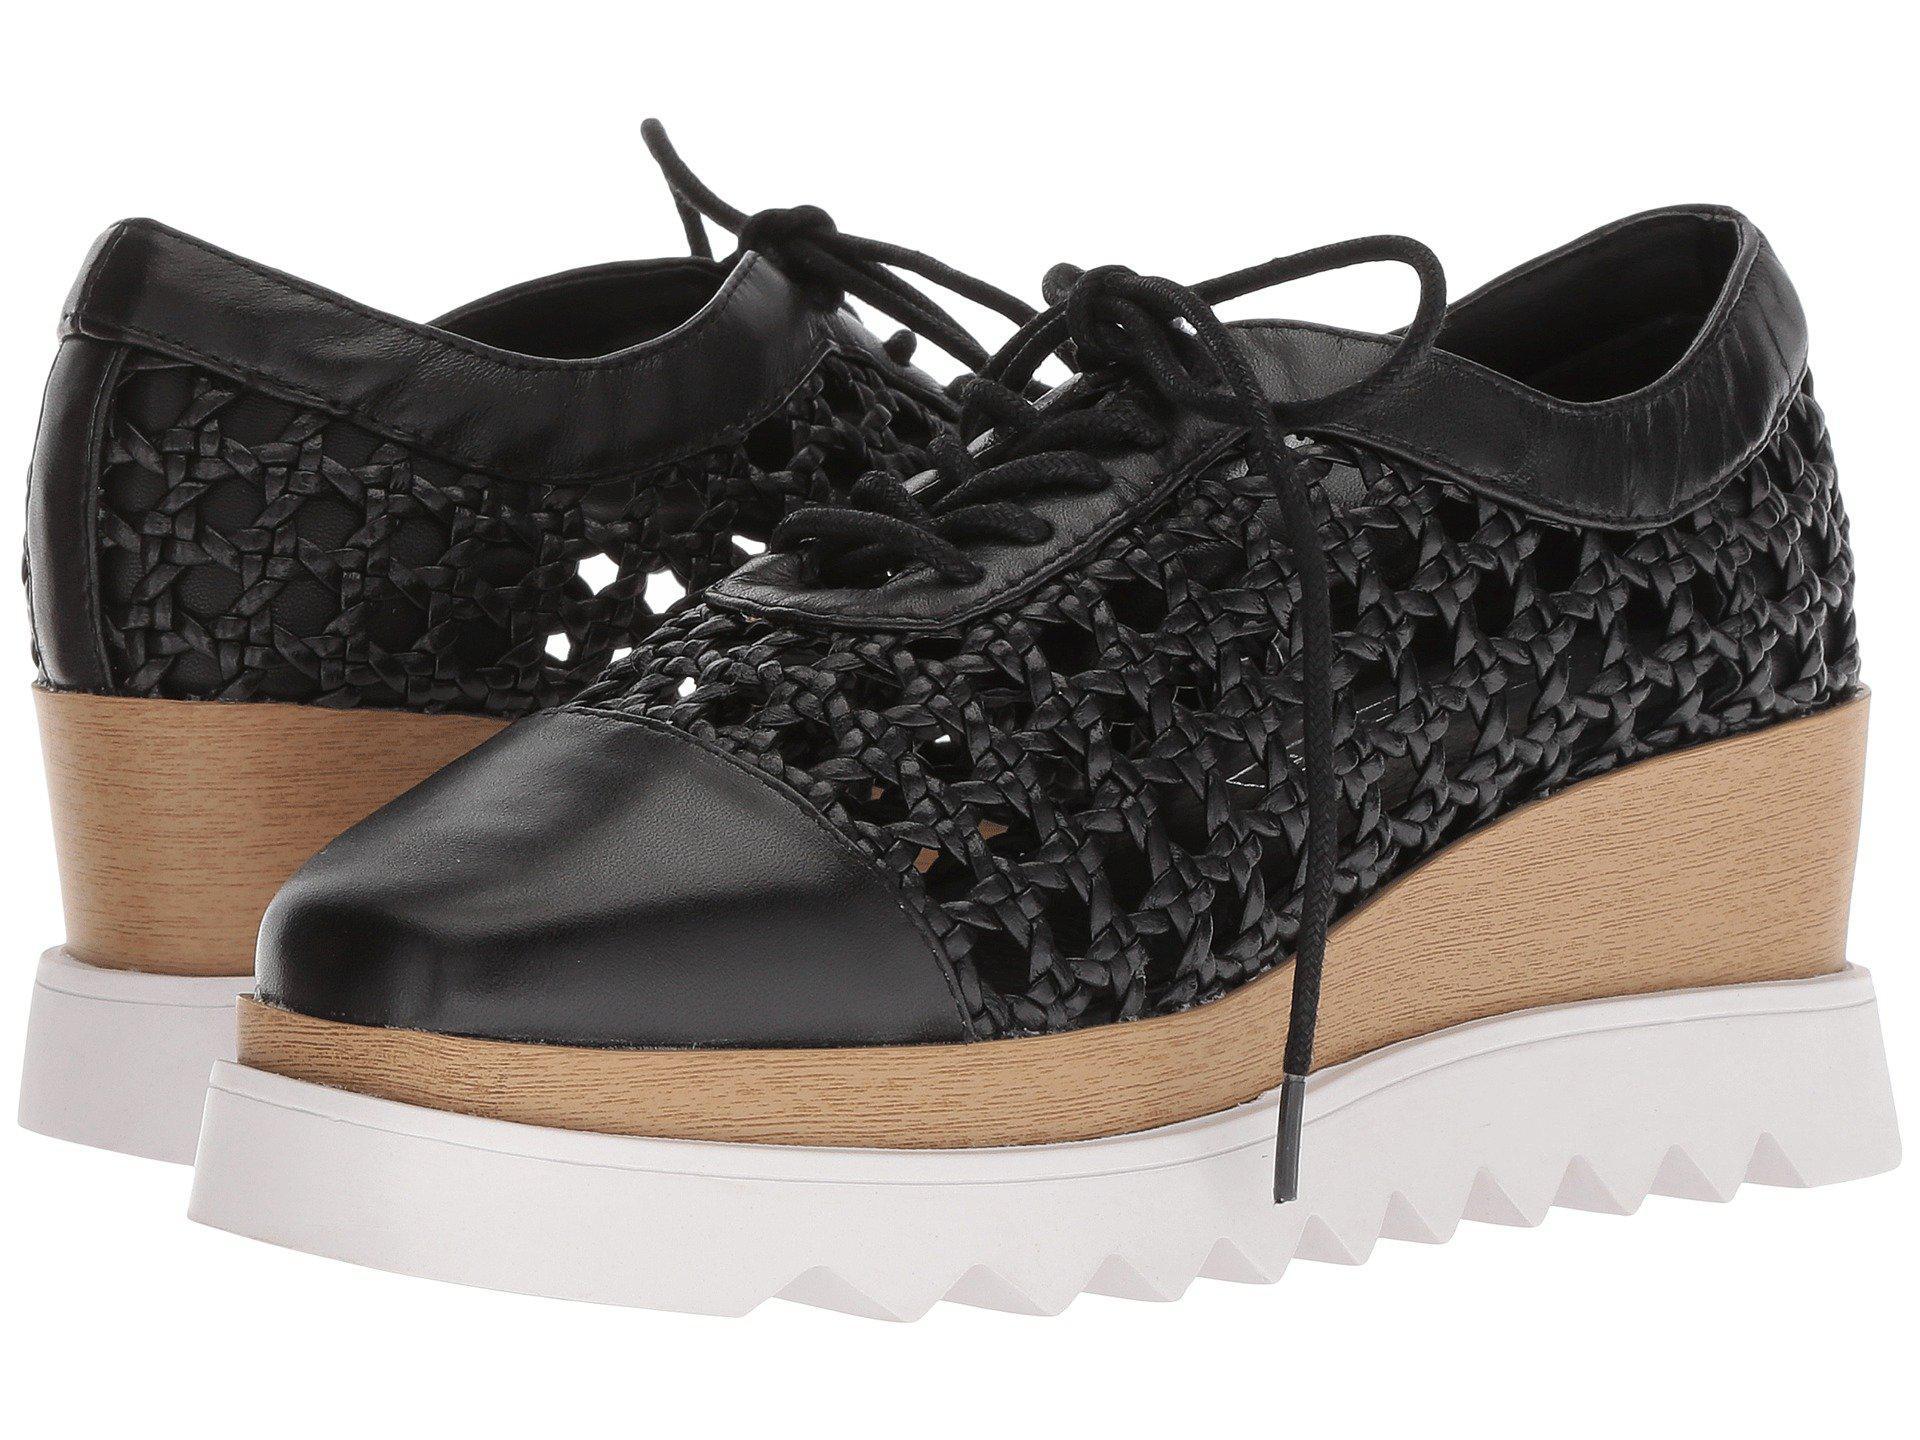 5dea3c32dda3 Lyst - Sol Sana Fremont Wedge (black) Women s Wedge Shoes in Black